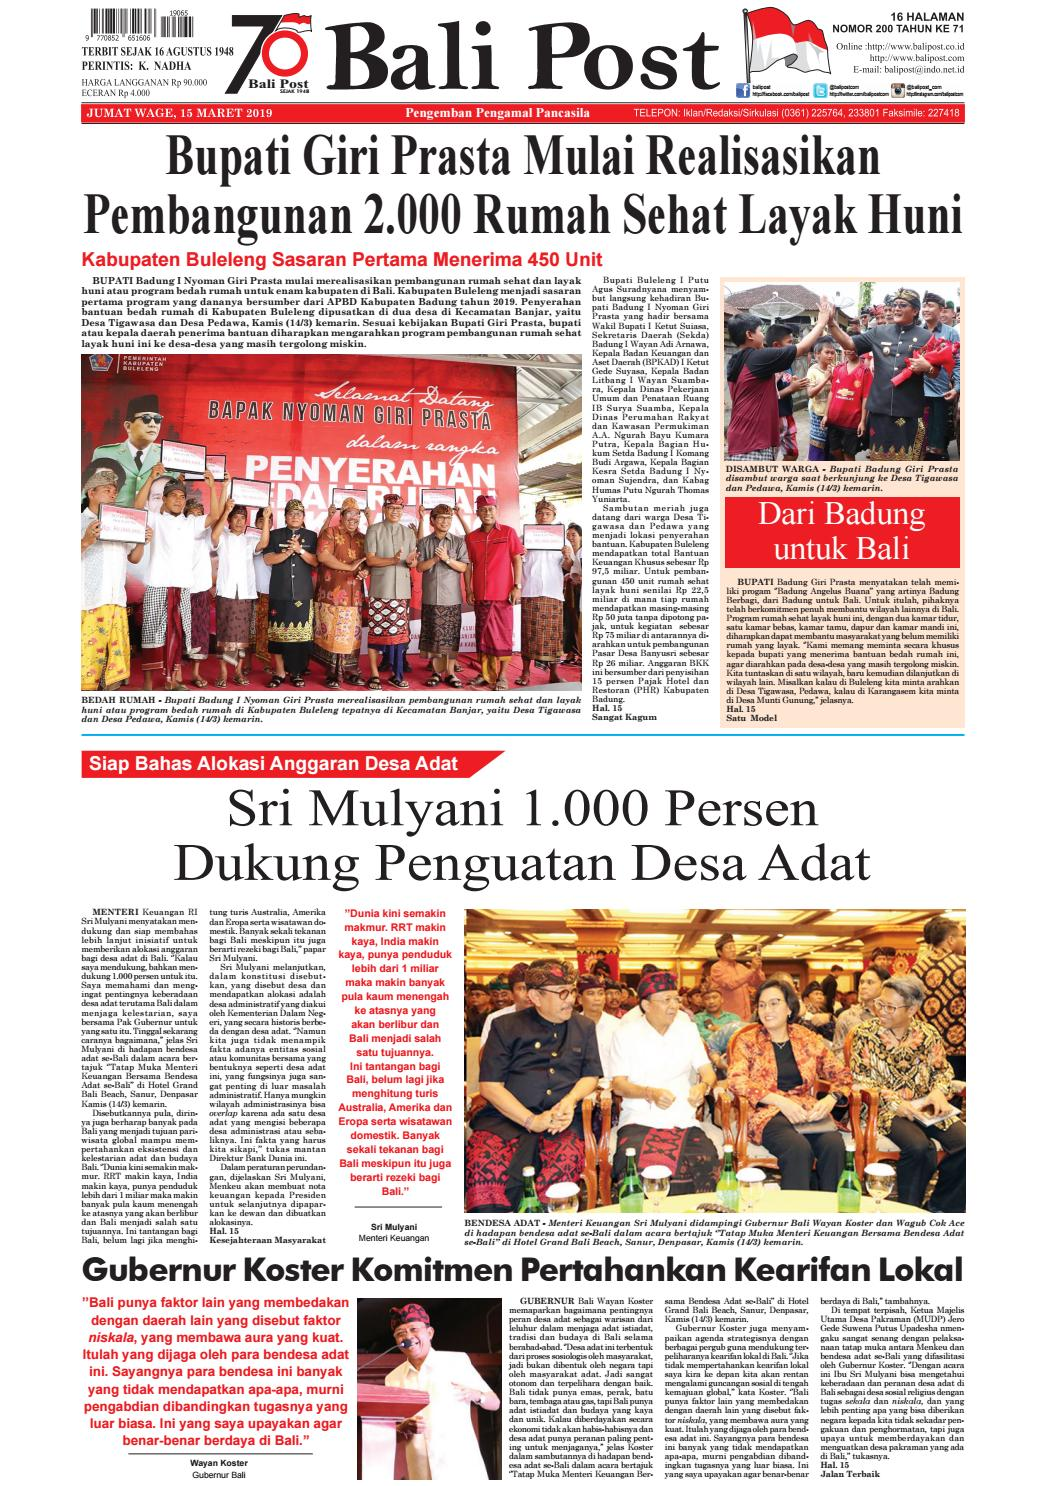 Edisi Jumat 15 Maret 2019 Balipost Com By E Paper Kmb Issuu